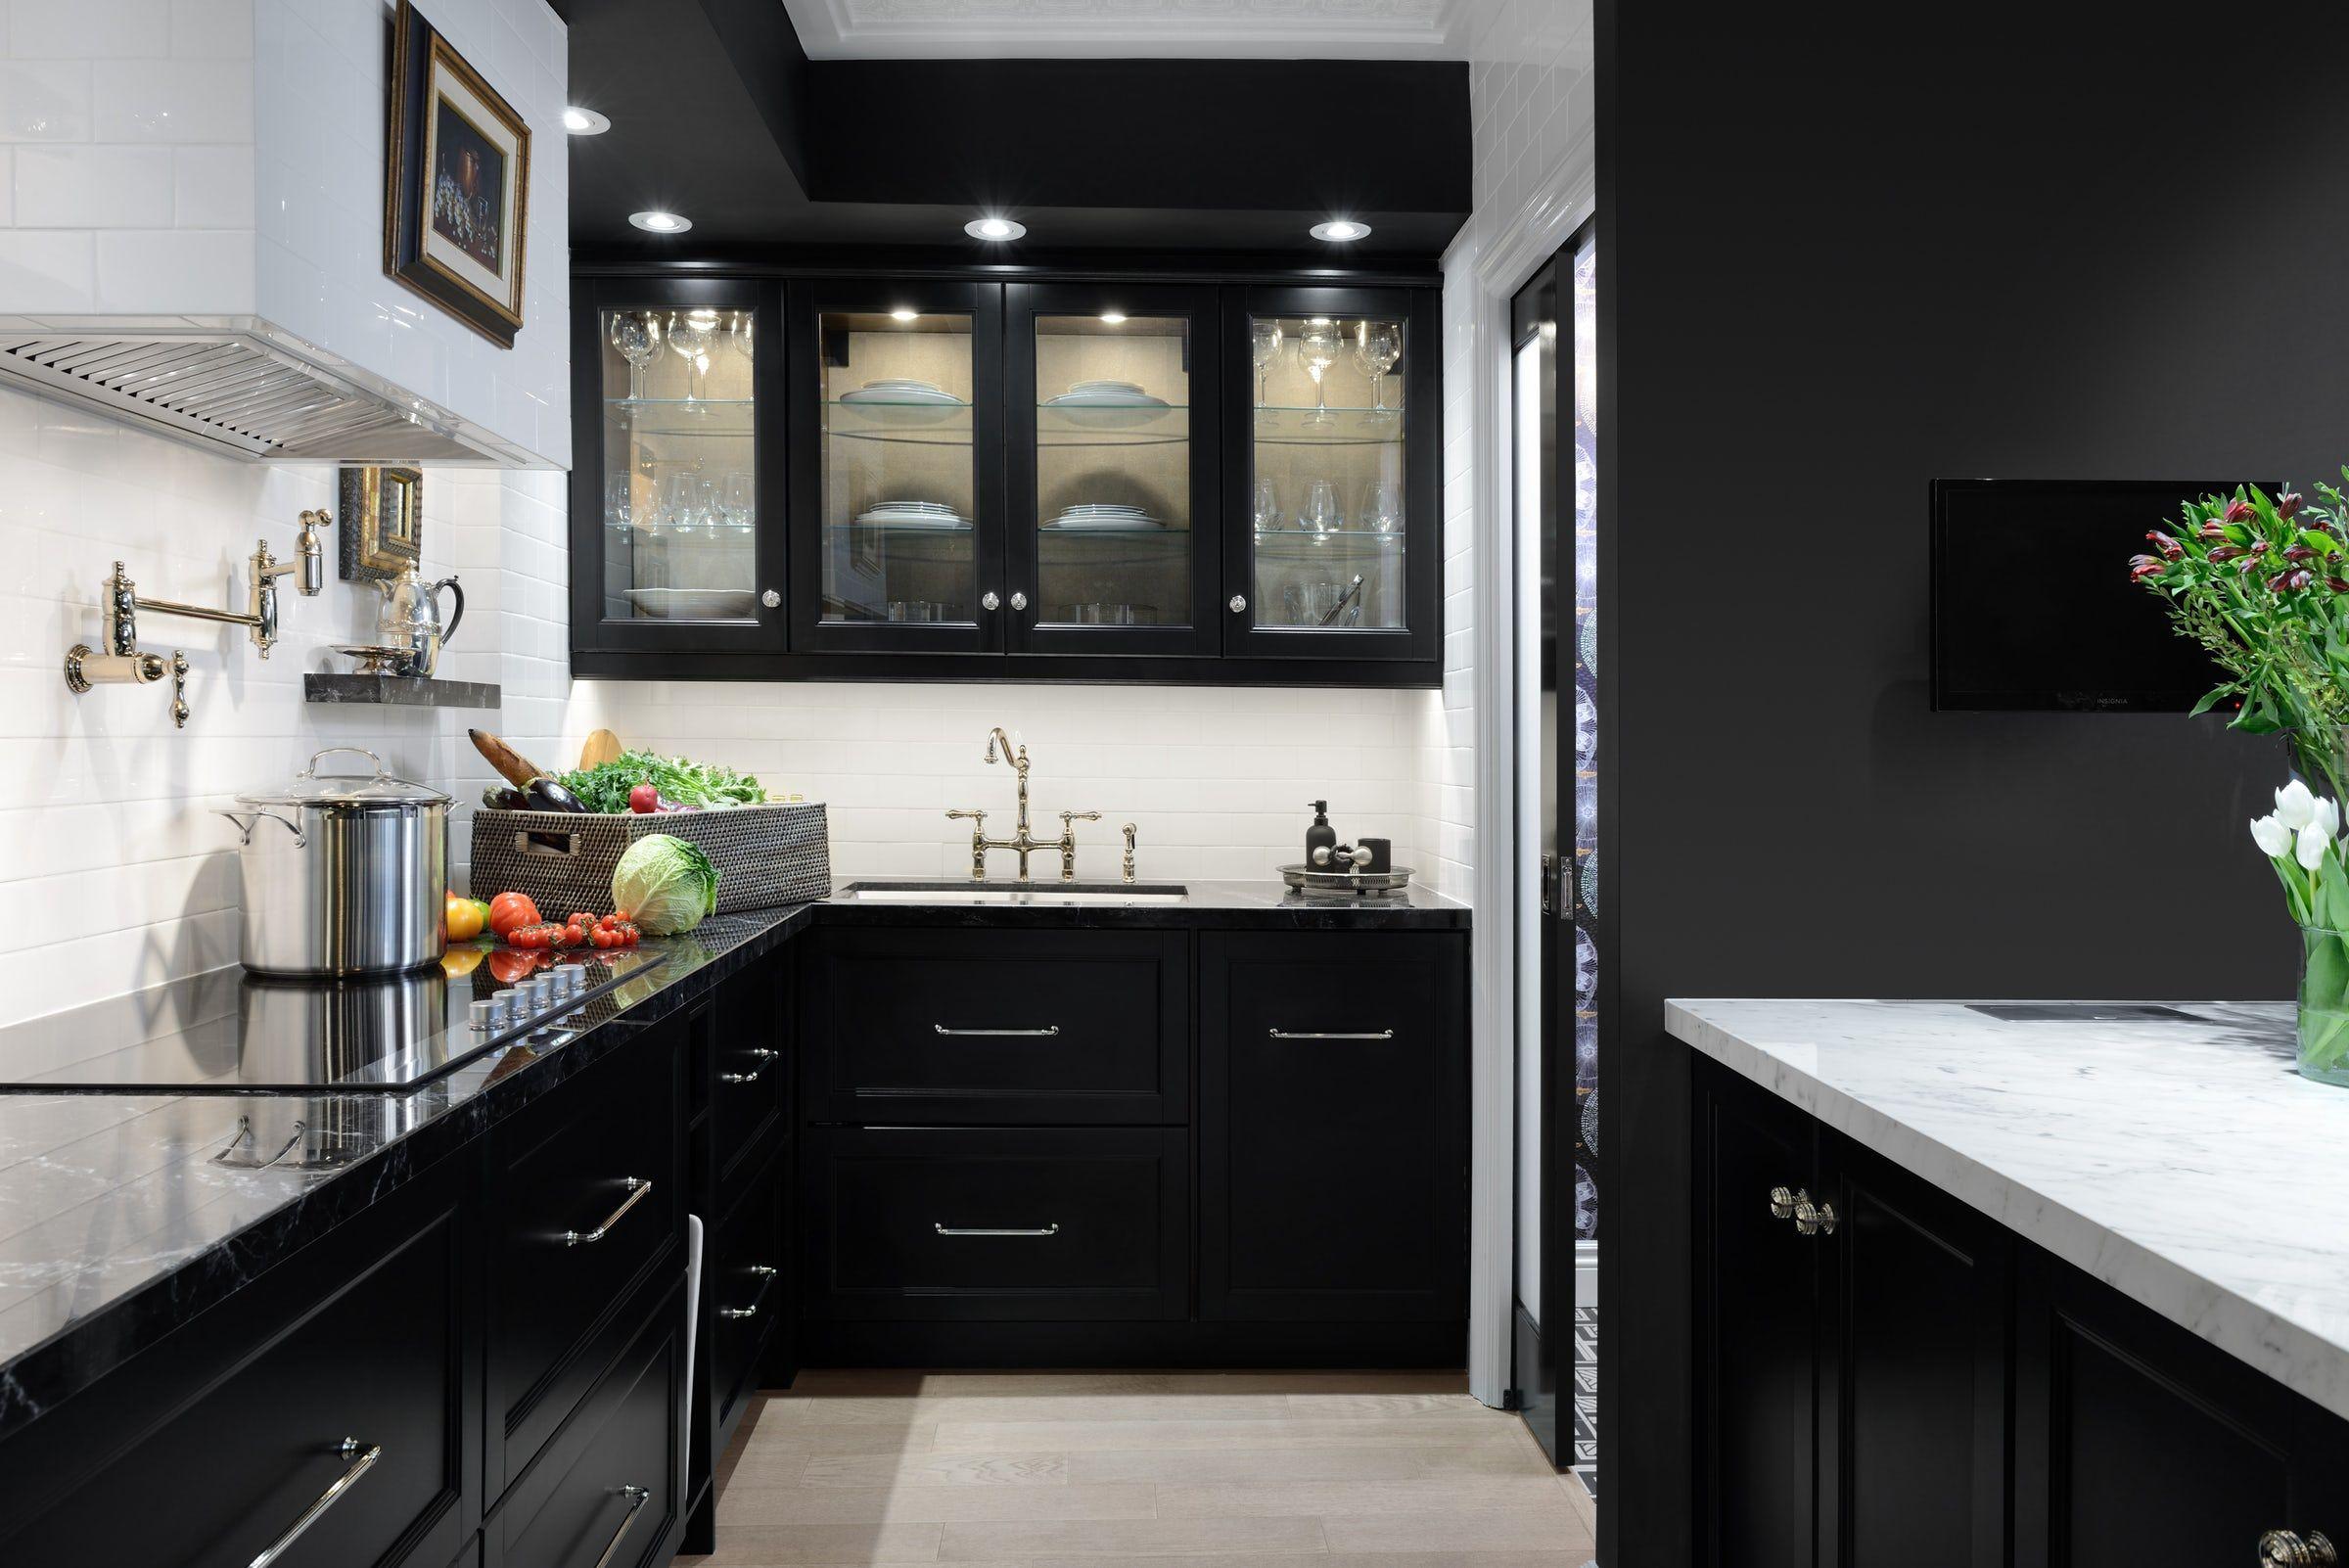 black kitchen cabinets & 30 Sophisticated Black Kitchen Cabinets - Kitchen Designs With Black ...